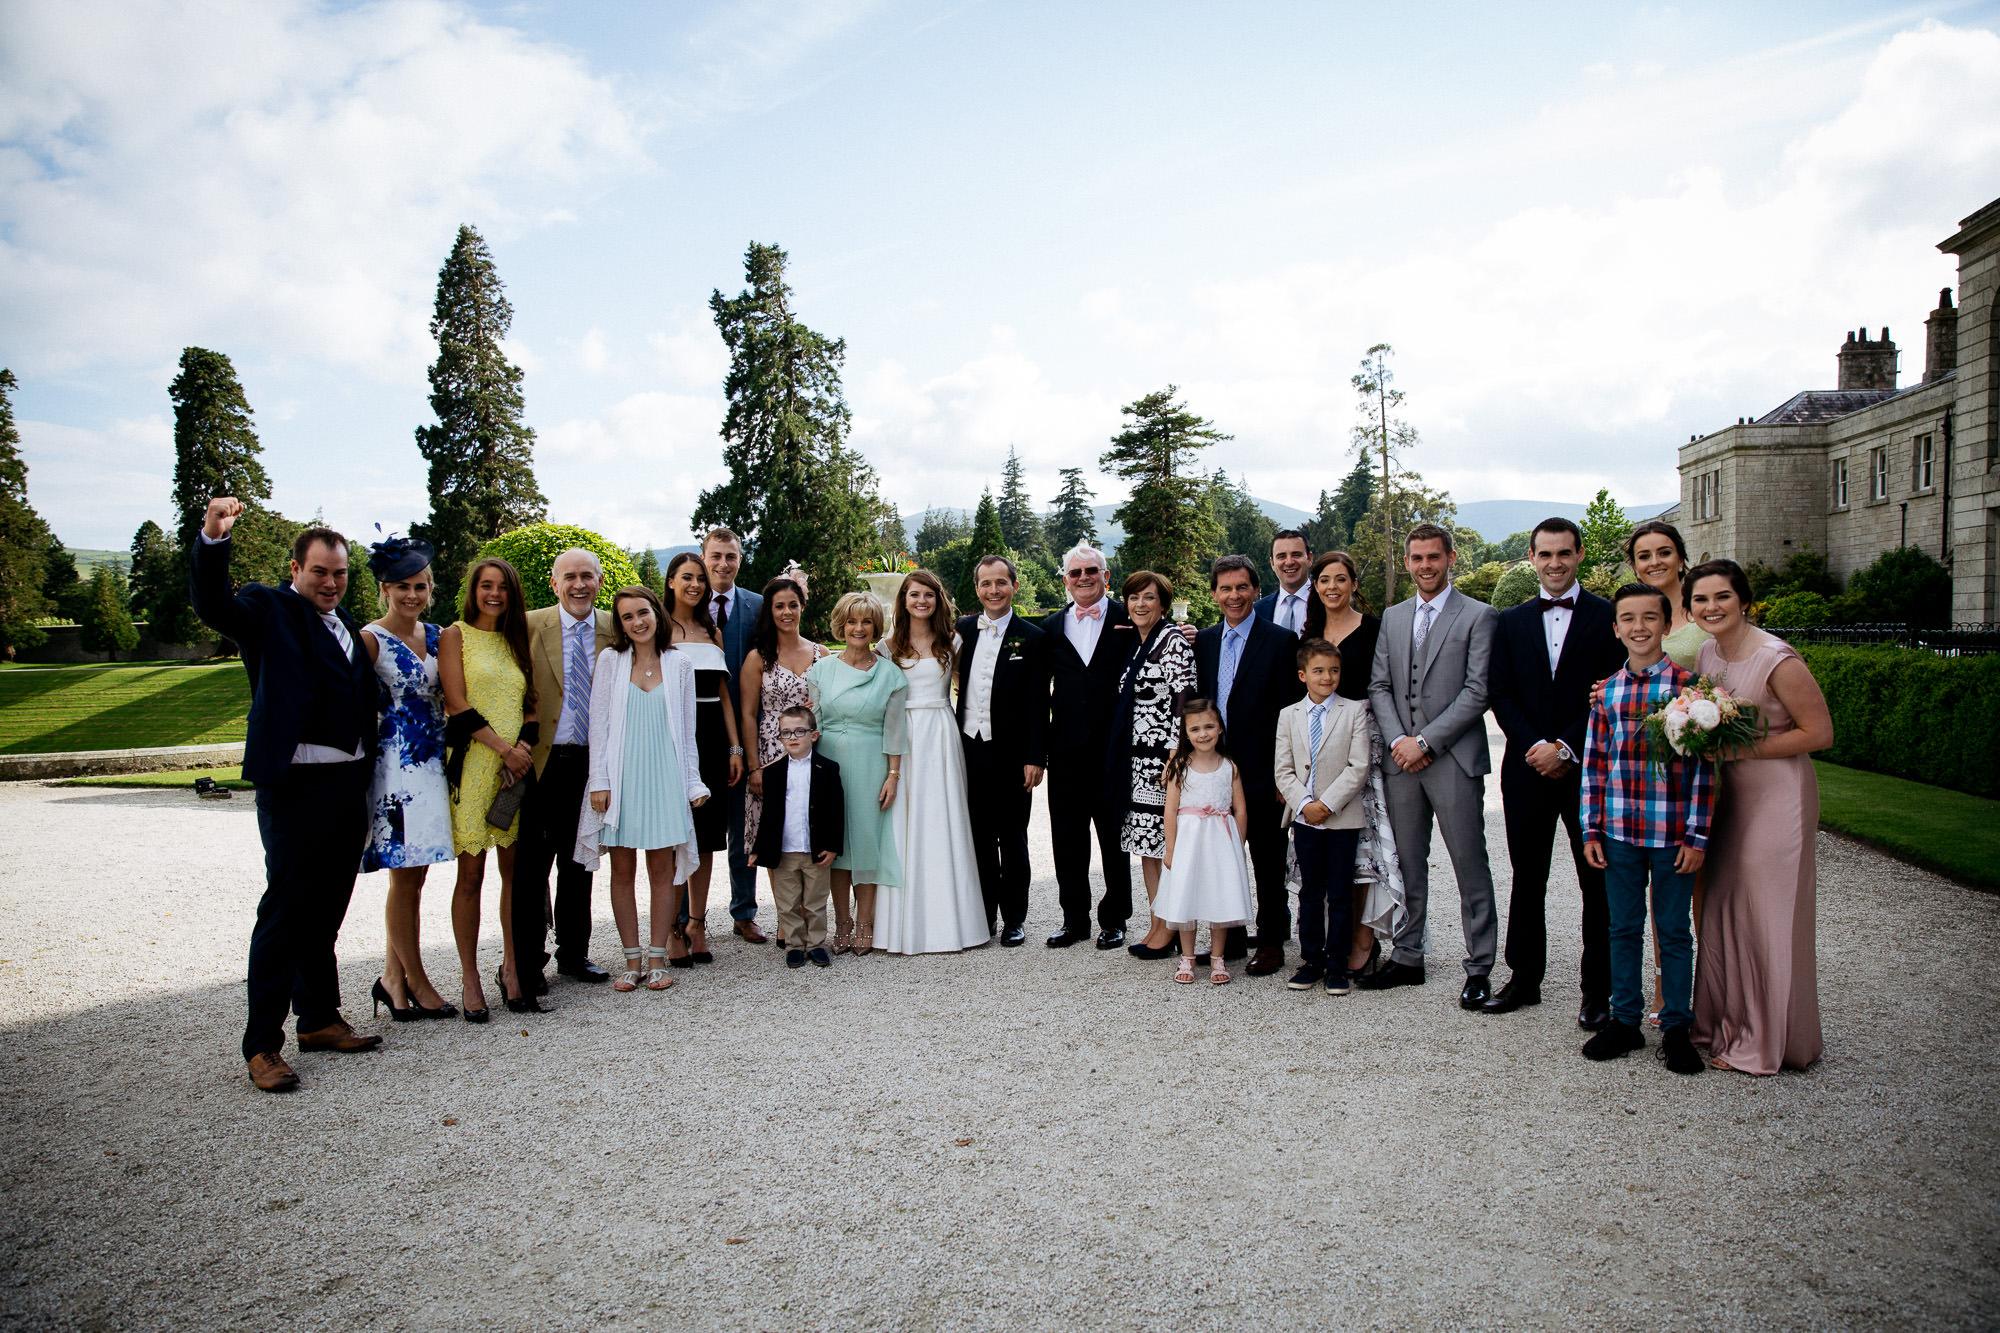 clairebyrnephotography-wedding-Emma-Max-25.jpg